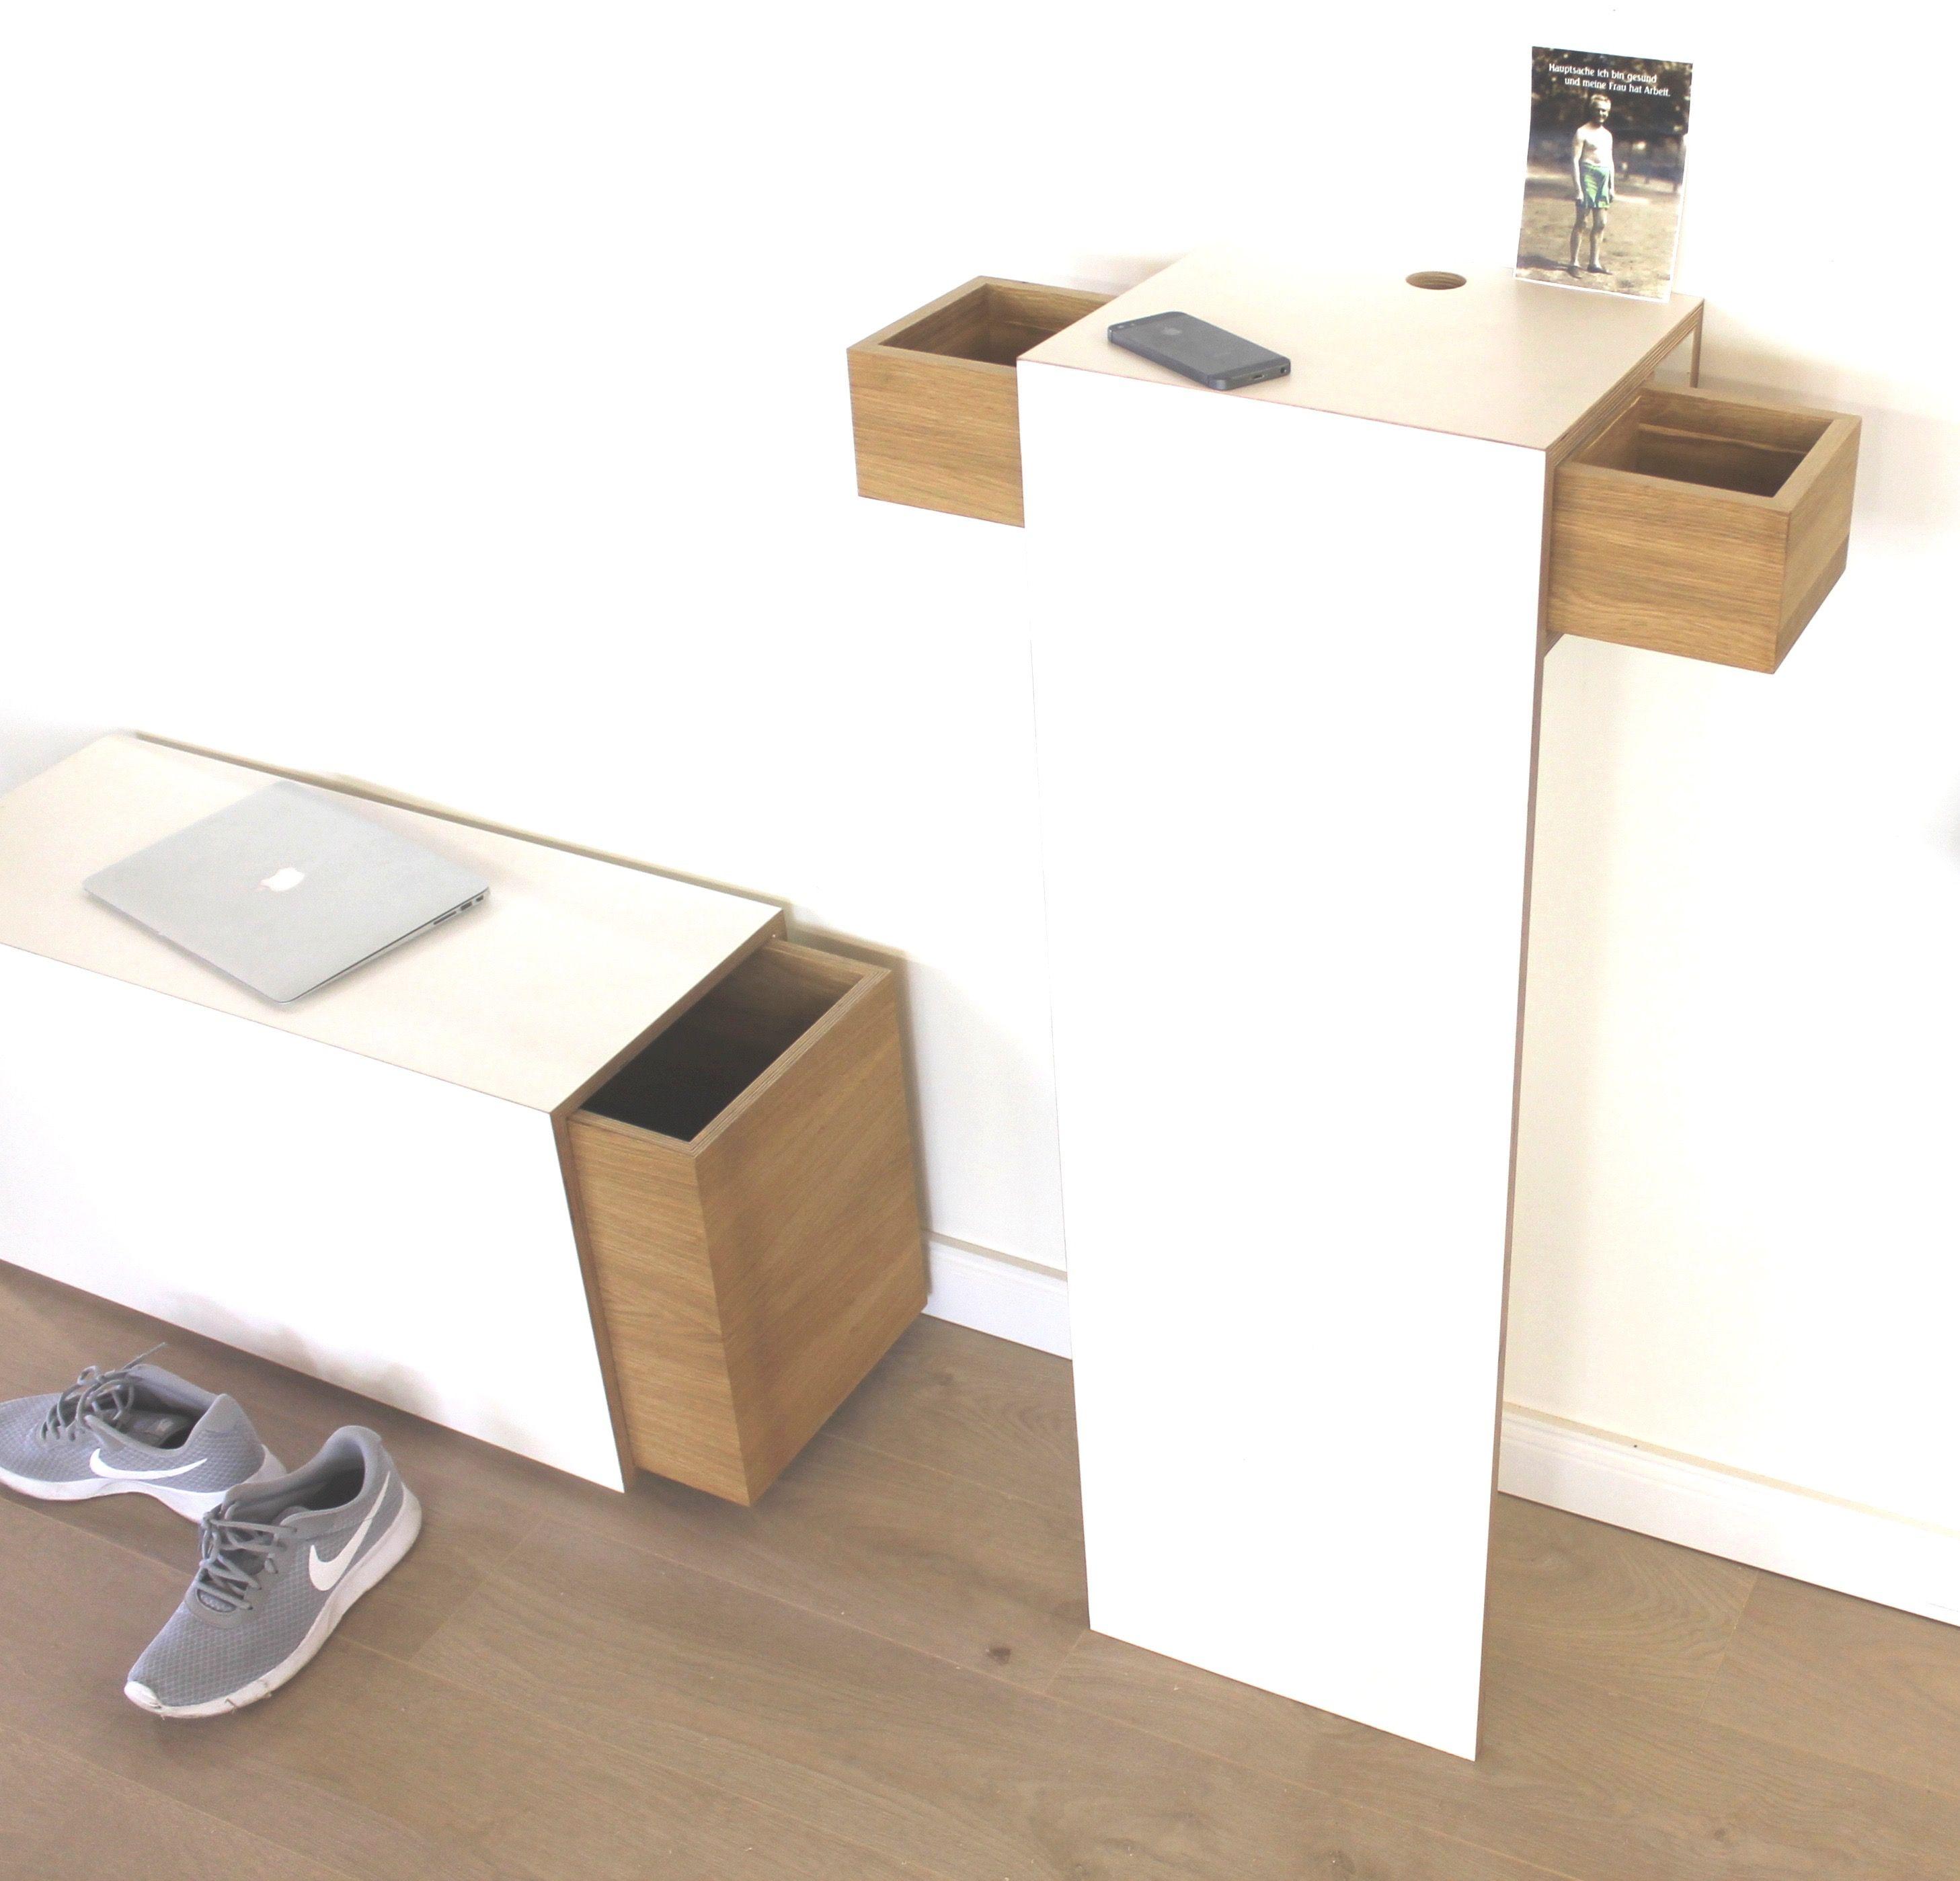 schuhbank mortimer in multiplex wei kombiniert mit eiche schuhbank mortimer pinterest. Black Bedroom Furniture Sets. Home Design Ideas